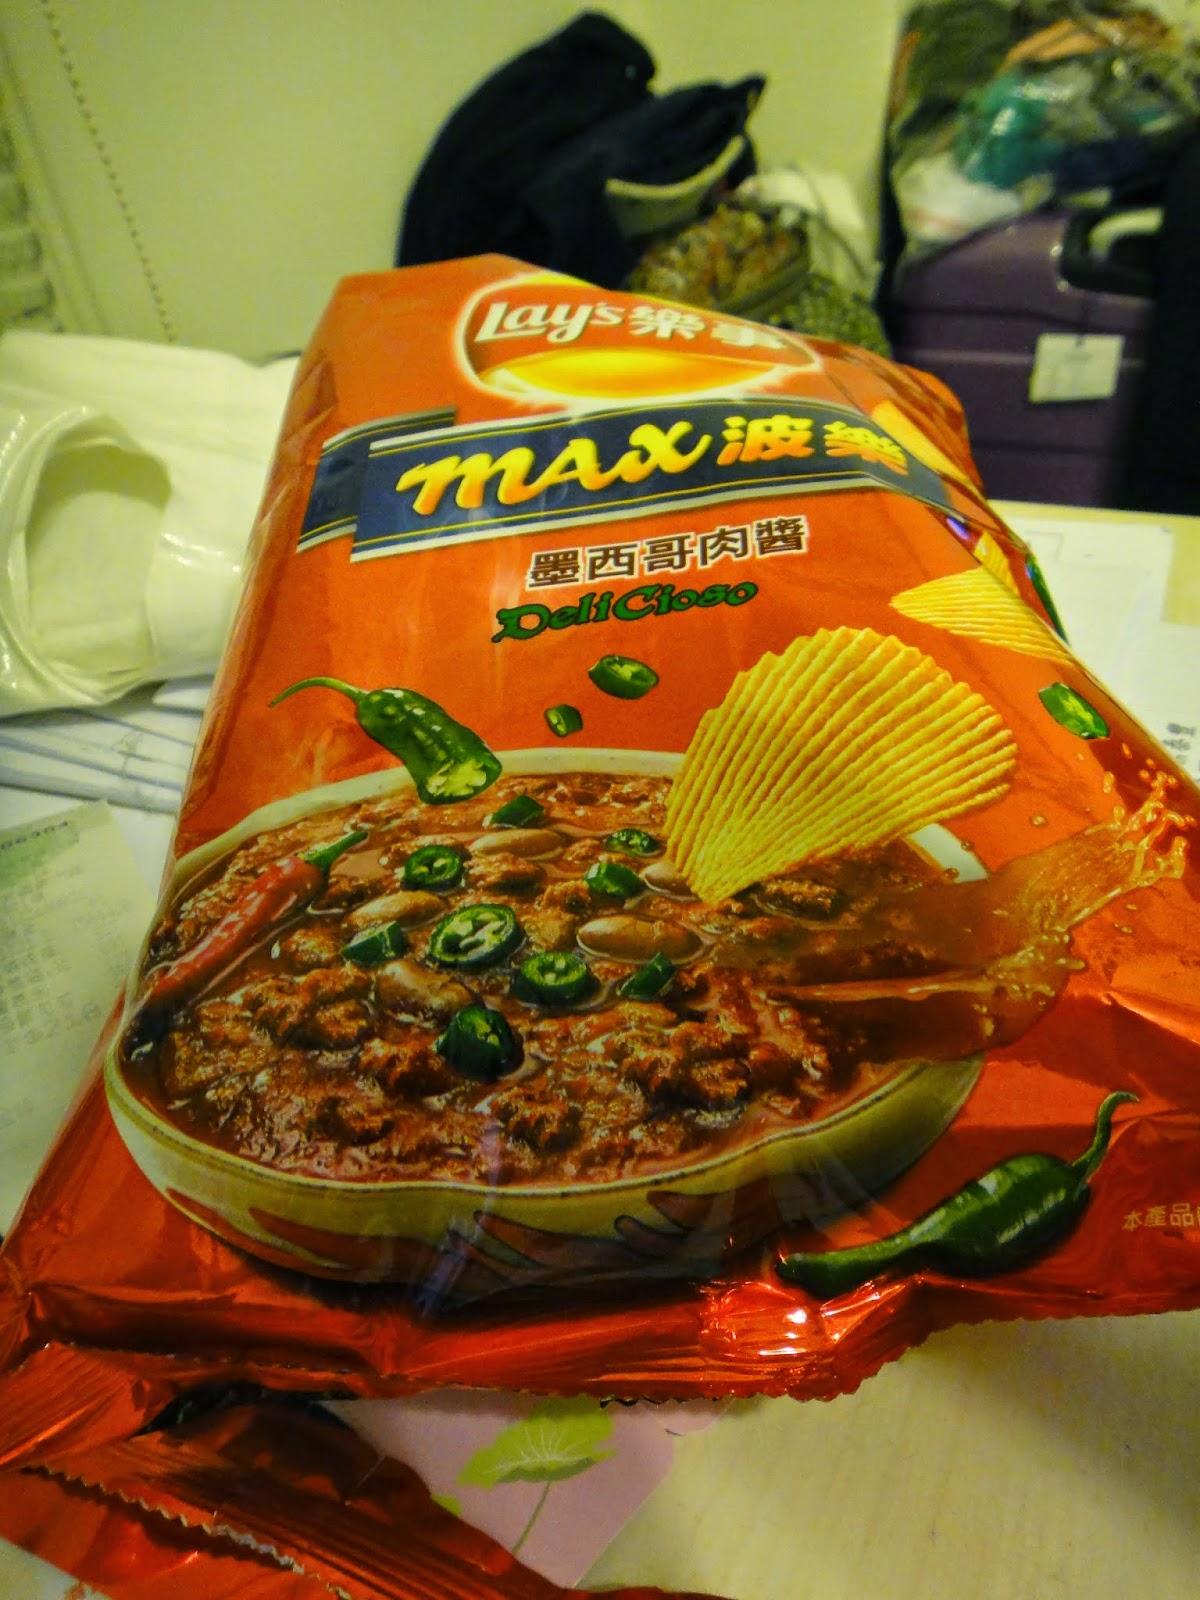 Spicy Jalapeno Lays Potato Chips Taiwan 7-11